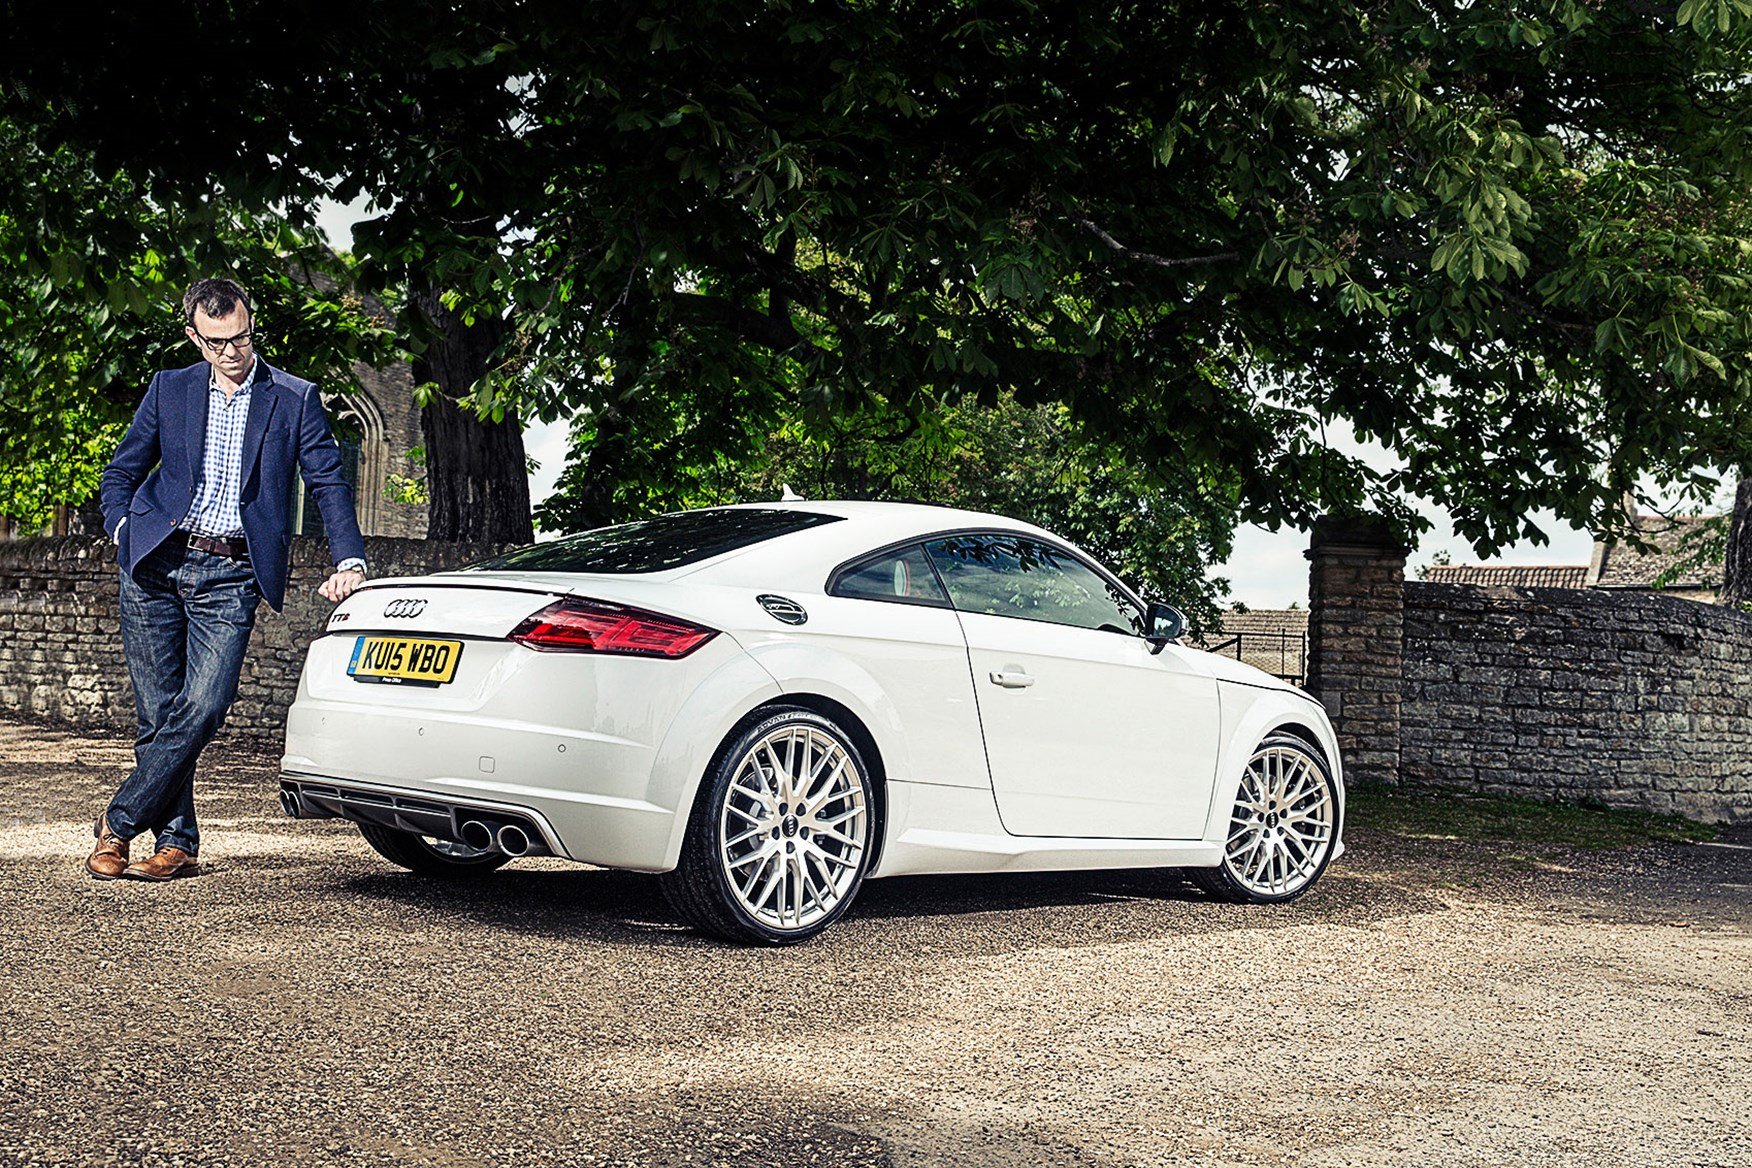 The New 2018 Aston Martin Vantage Revealed In S Car Magazine. Tim Pollard With Car's Audi Tts Longtermer. Audi. Audi Tt 1 8t 2000 Ground Wiring Location At Scoala.co